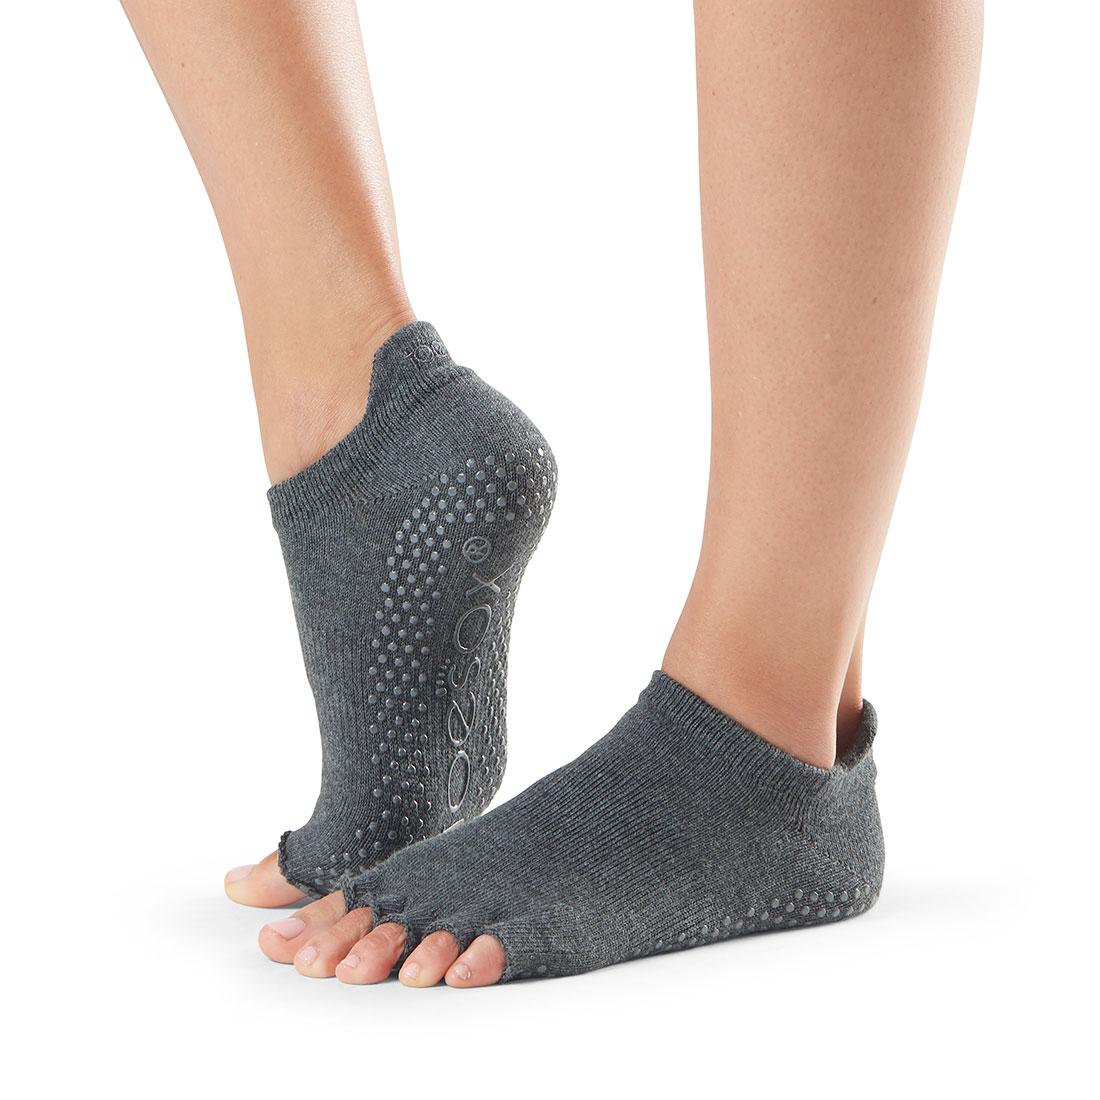 Yogasocken ToeSox Low Rise Half Toe Charcoal Grey